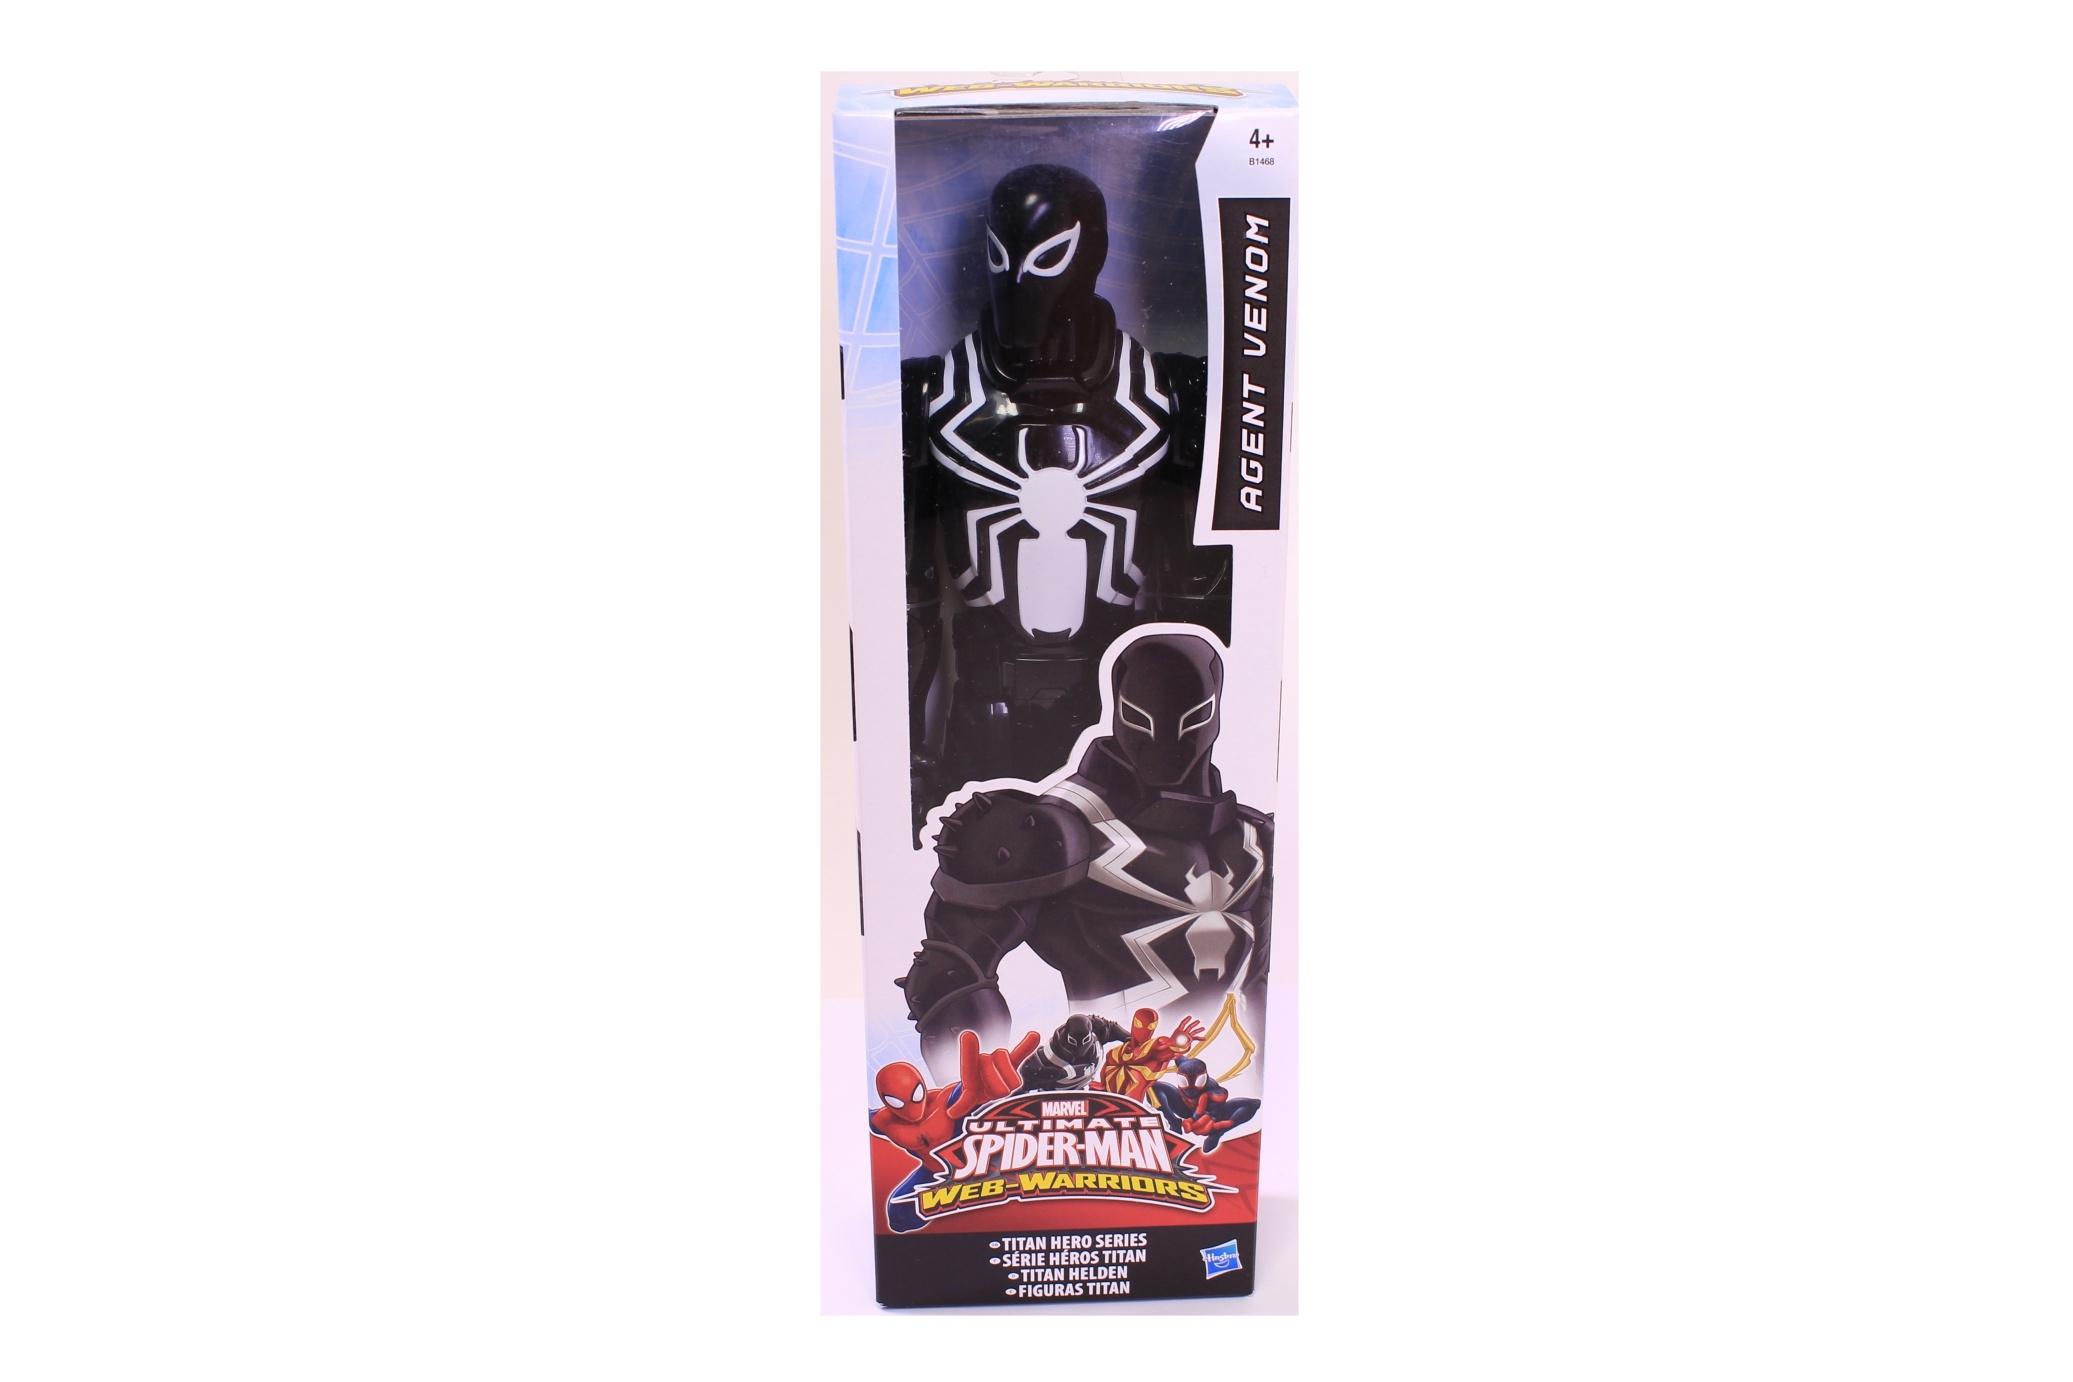 Onlinesailin OLS Custom LEGO Agent Venom Minifigure Mint